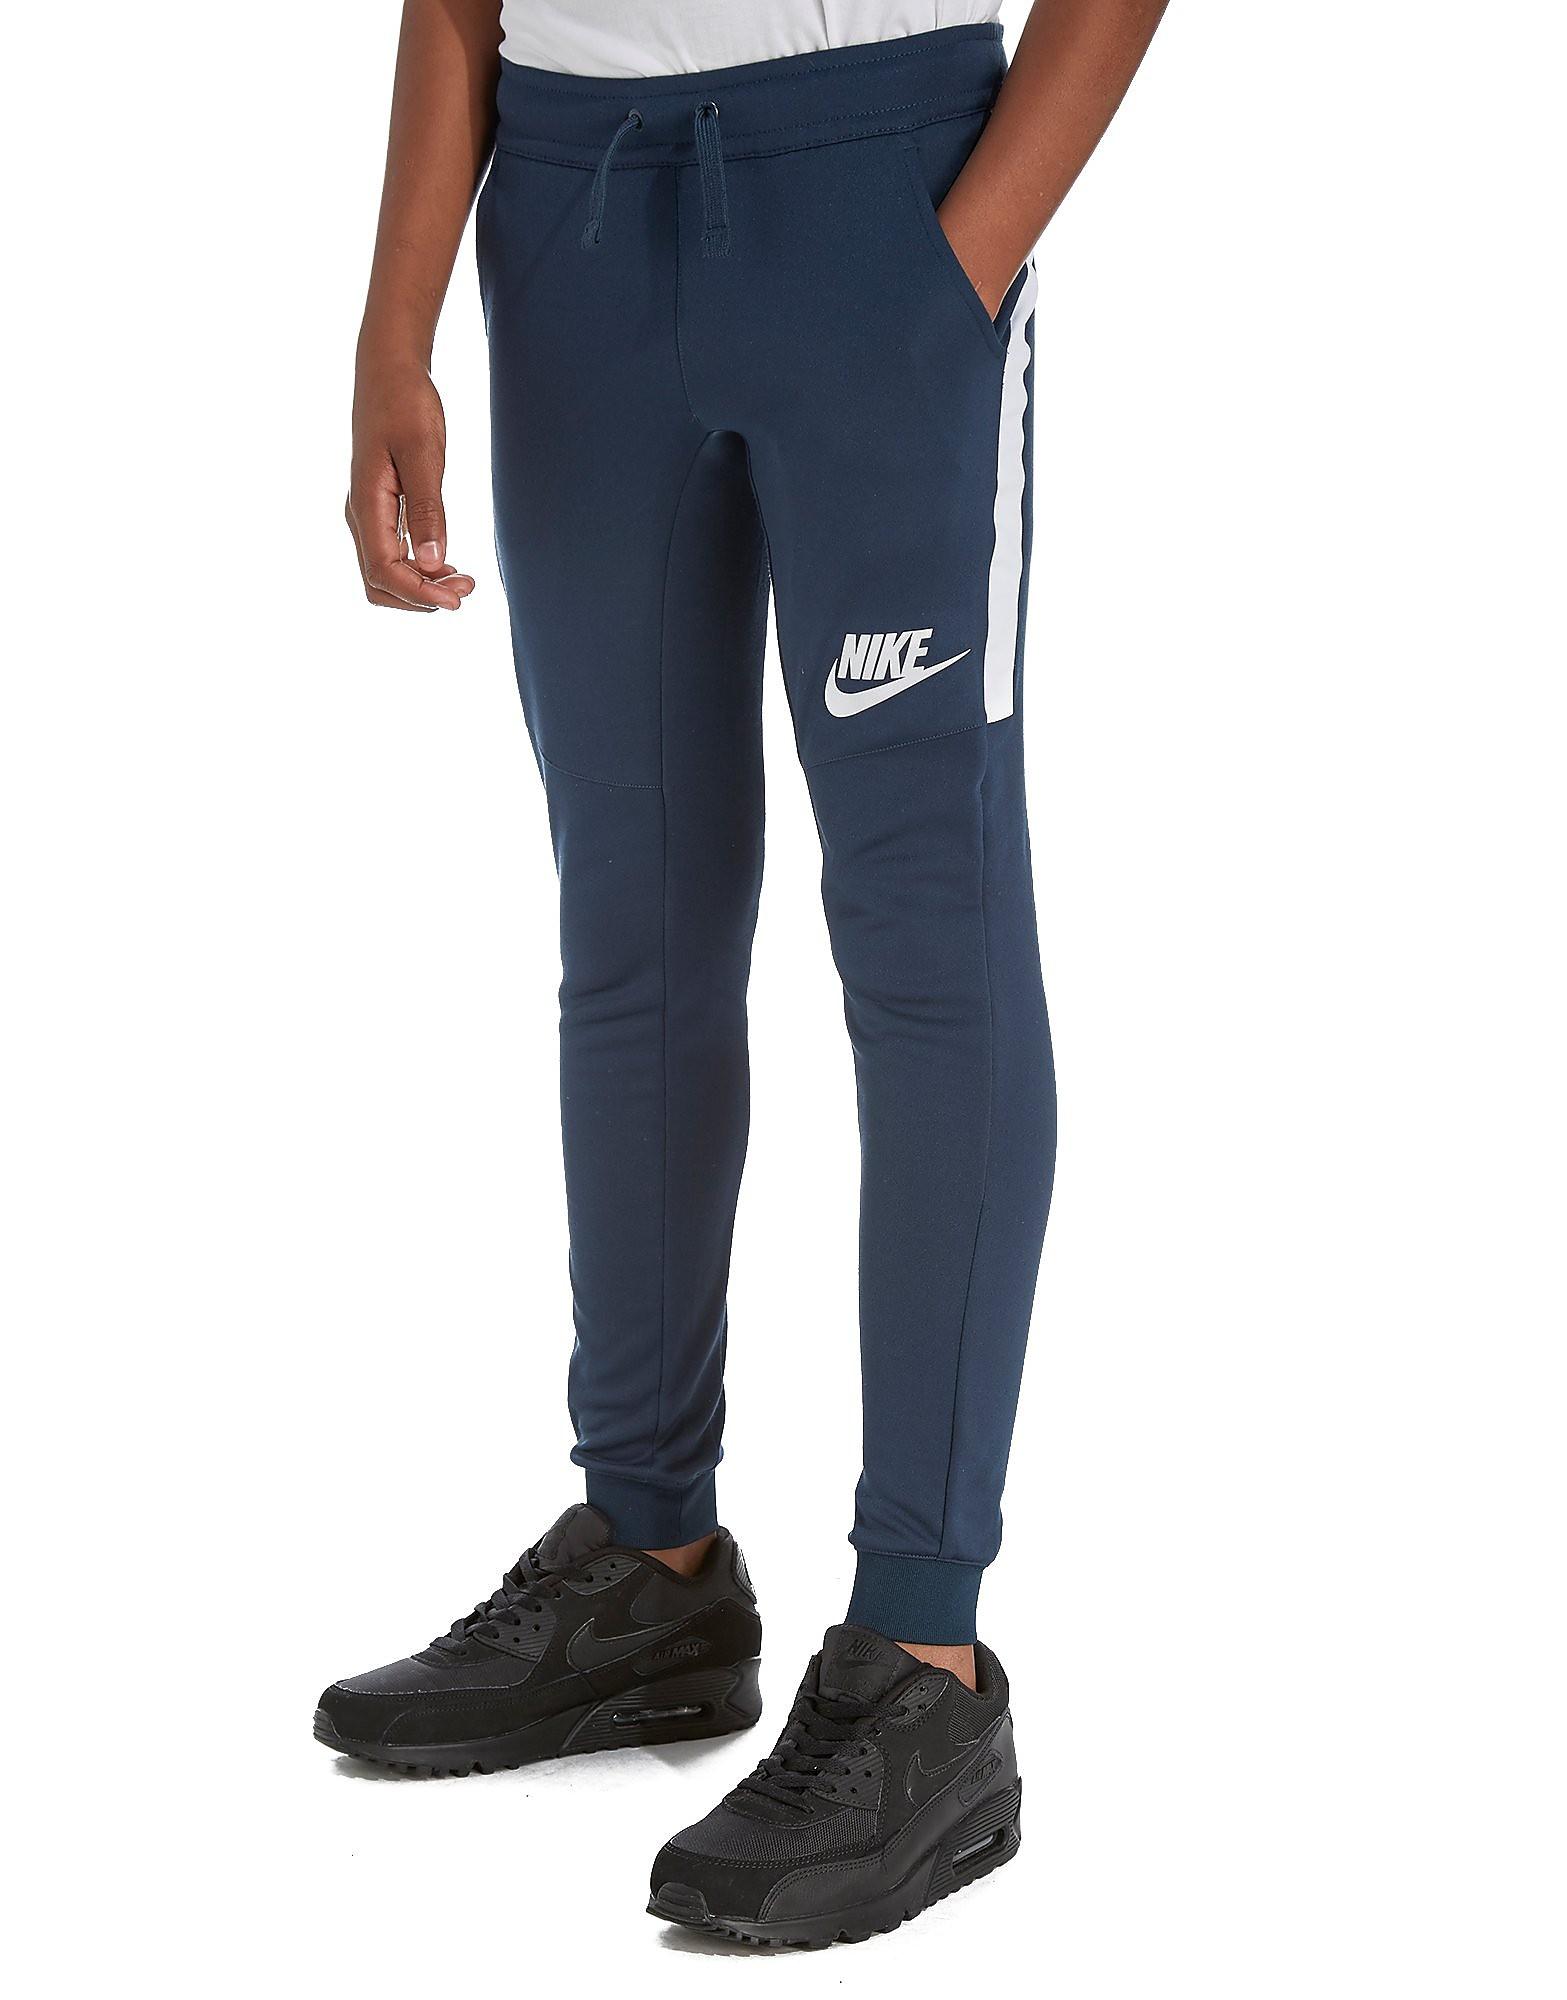 Nike pantalón de chándal Tribute Cuff júnior